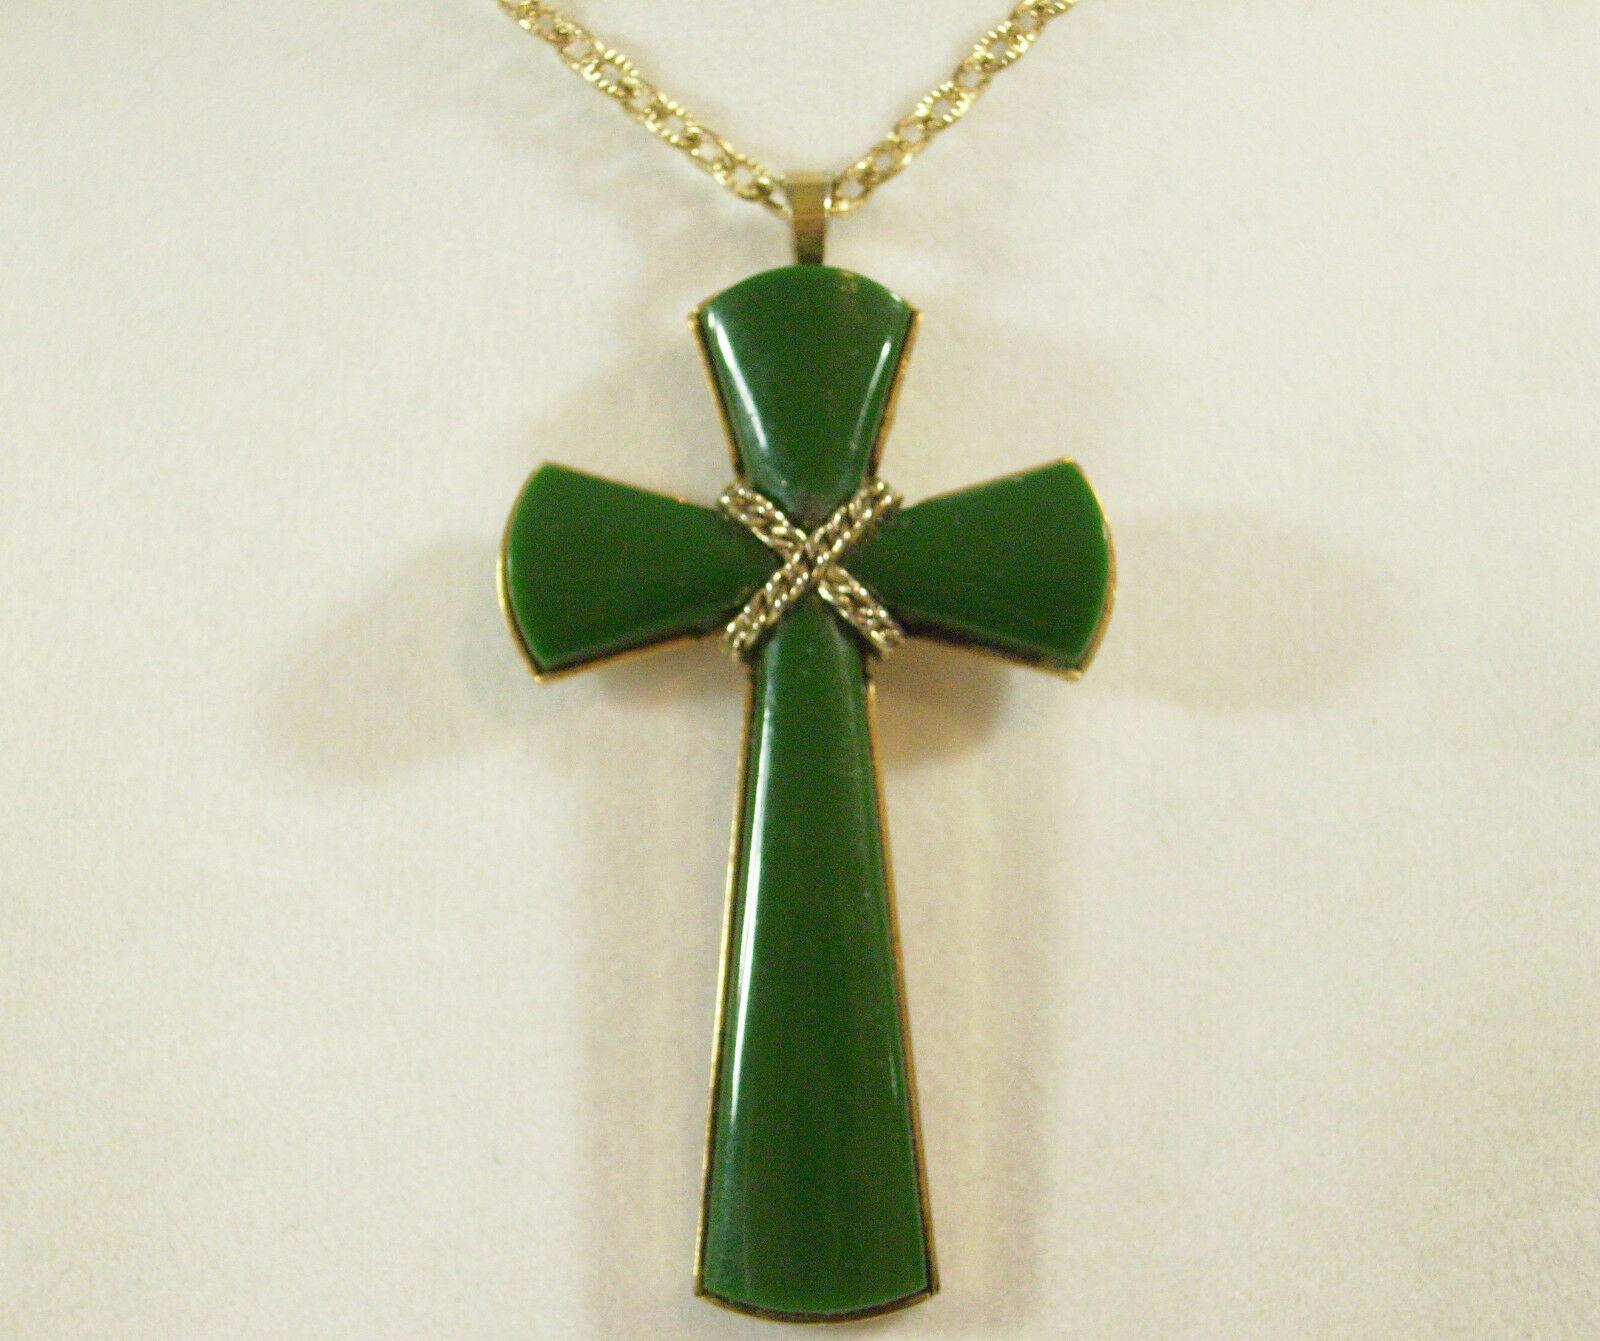 AVON JADE Green JULIETTE CROSS Pendant Chain Necklace Gold Plated Vintage Estate